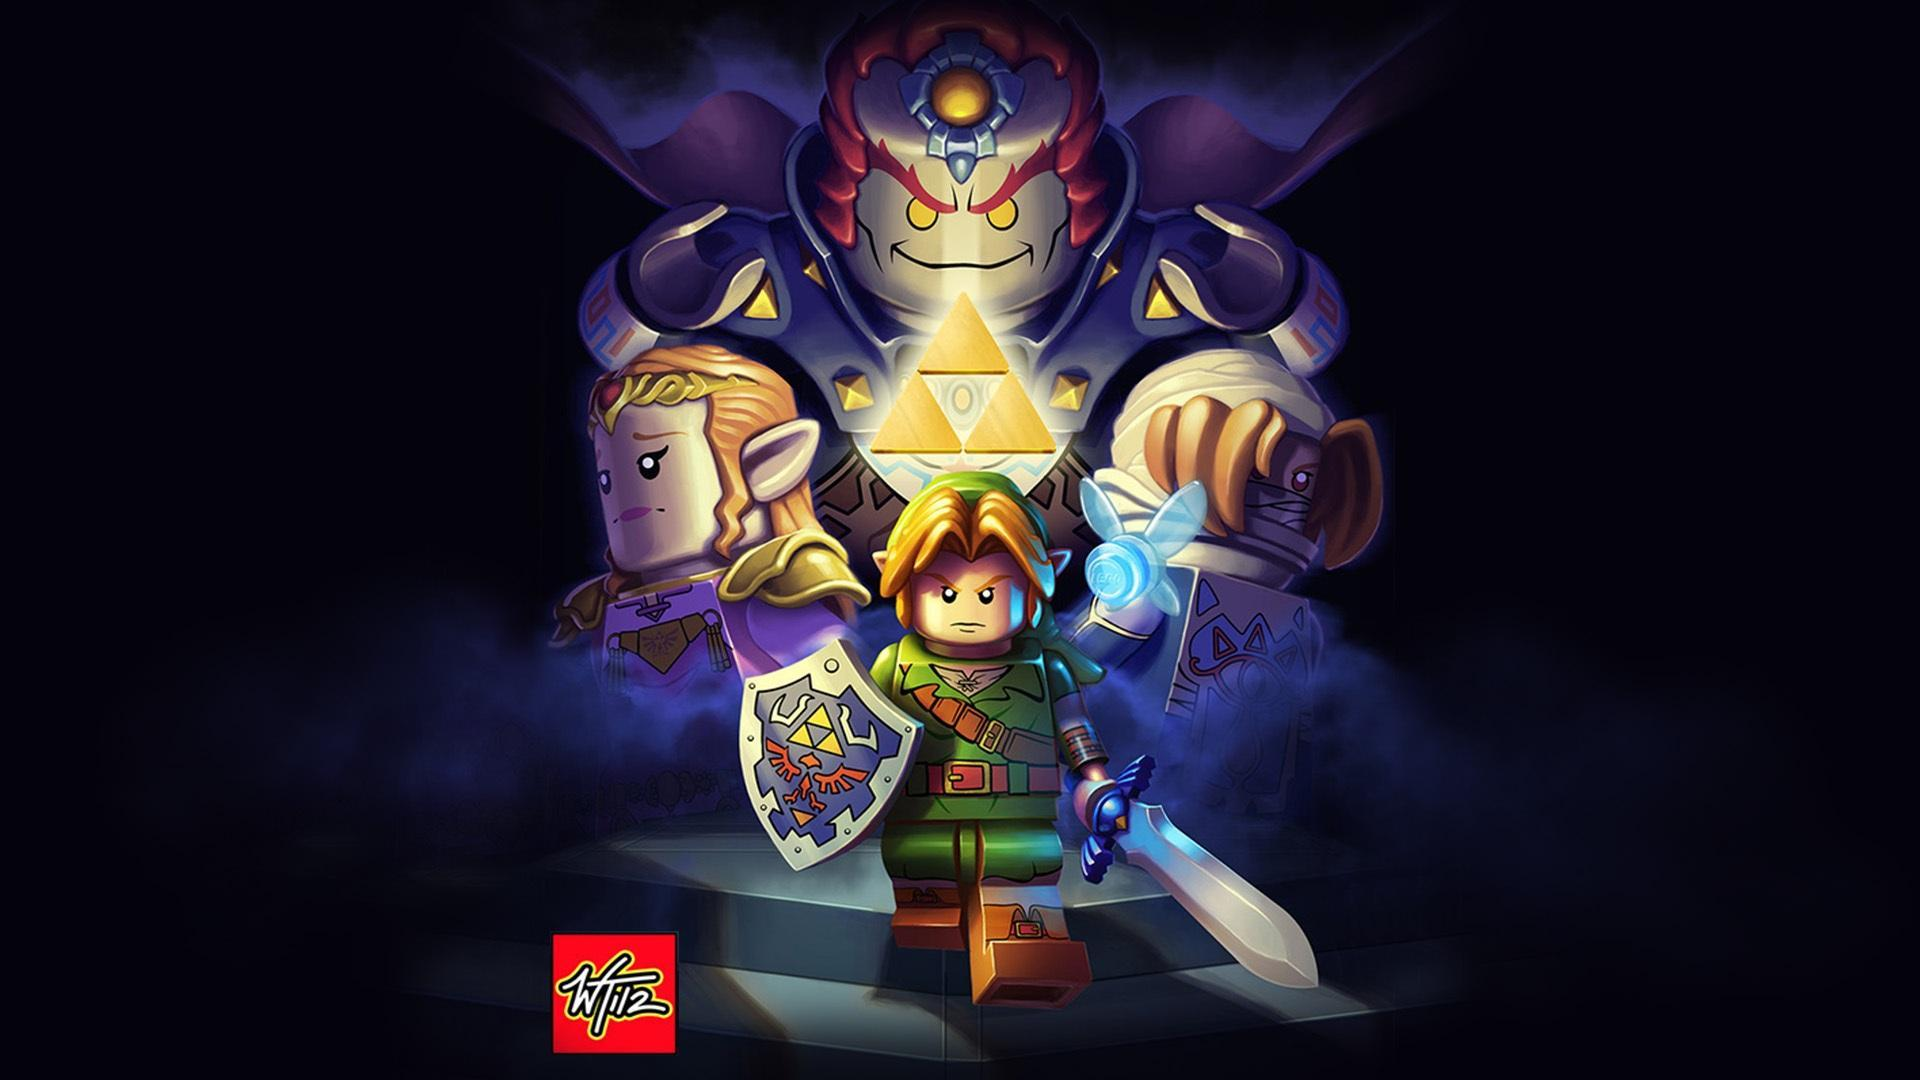 General 1920x1080 The Legend of Zelda Link Nintendo Master Sword Hylian Shield Ganondorf Princess Zelda LEGO Sheik navi The Legend of Zelda: Ocarina of Time watermarked